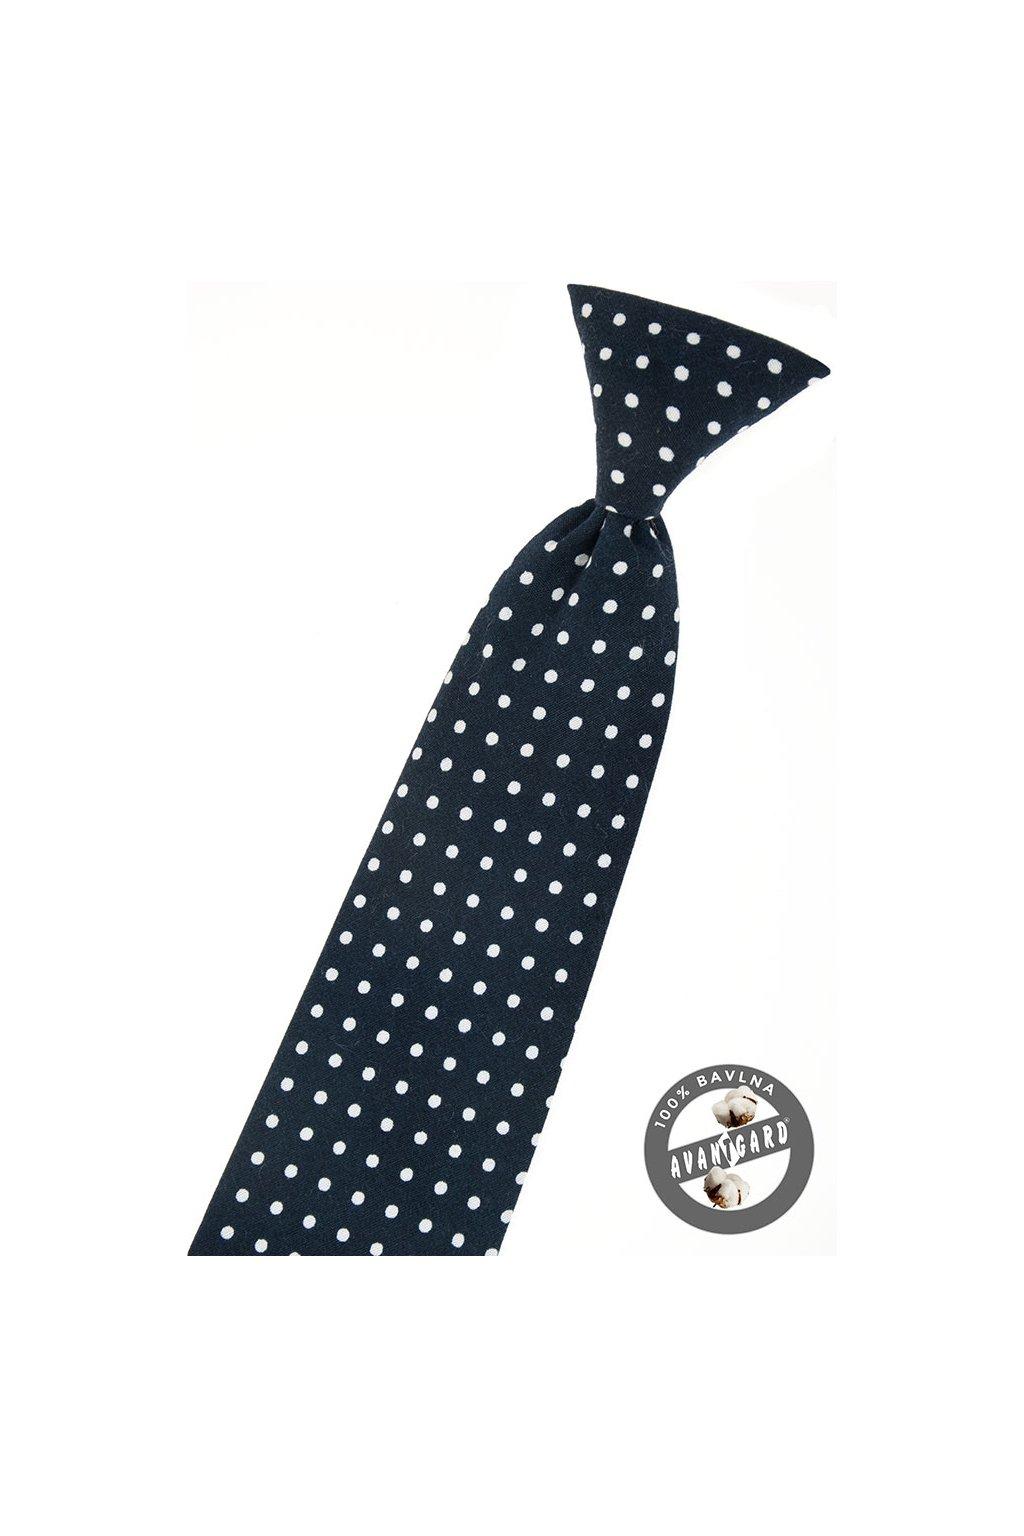 Chlapecká kravata, 558-5138, Modrá s bílým puntíkem